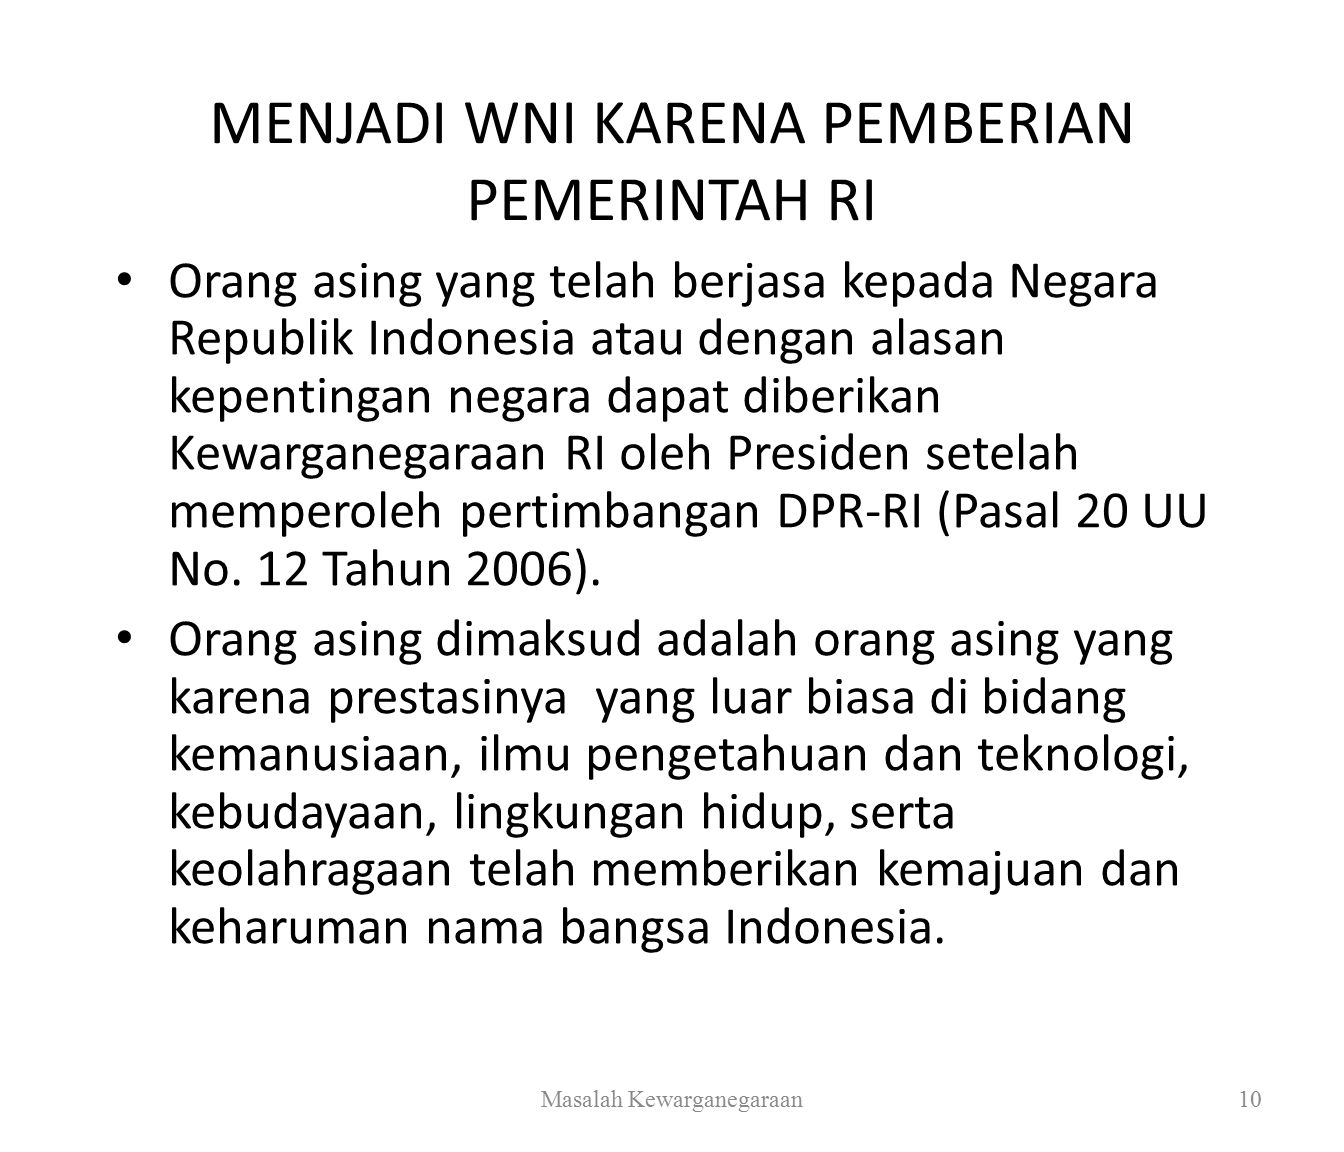 MENJADI WNI KARENA PEMBERIAN PEMERINTAH RI Orang asing yang telah berjasa kepada Negara Republik Indonesia atau dengan alasan kepentingan negara dapat diberikan Kewarganegaraan RI oleh Presiden setelah memperoleh pertimbangan DPR-RI (Pasal 20 UU No.